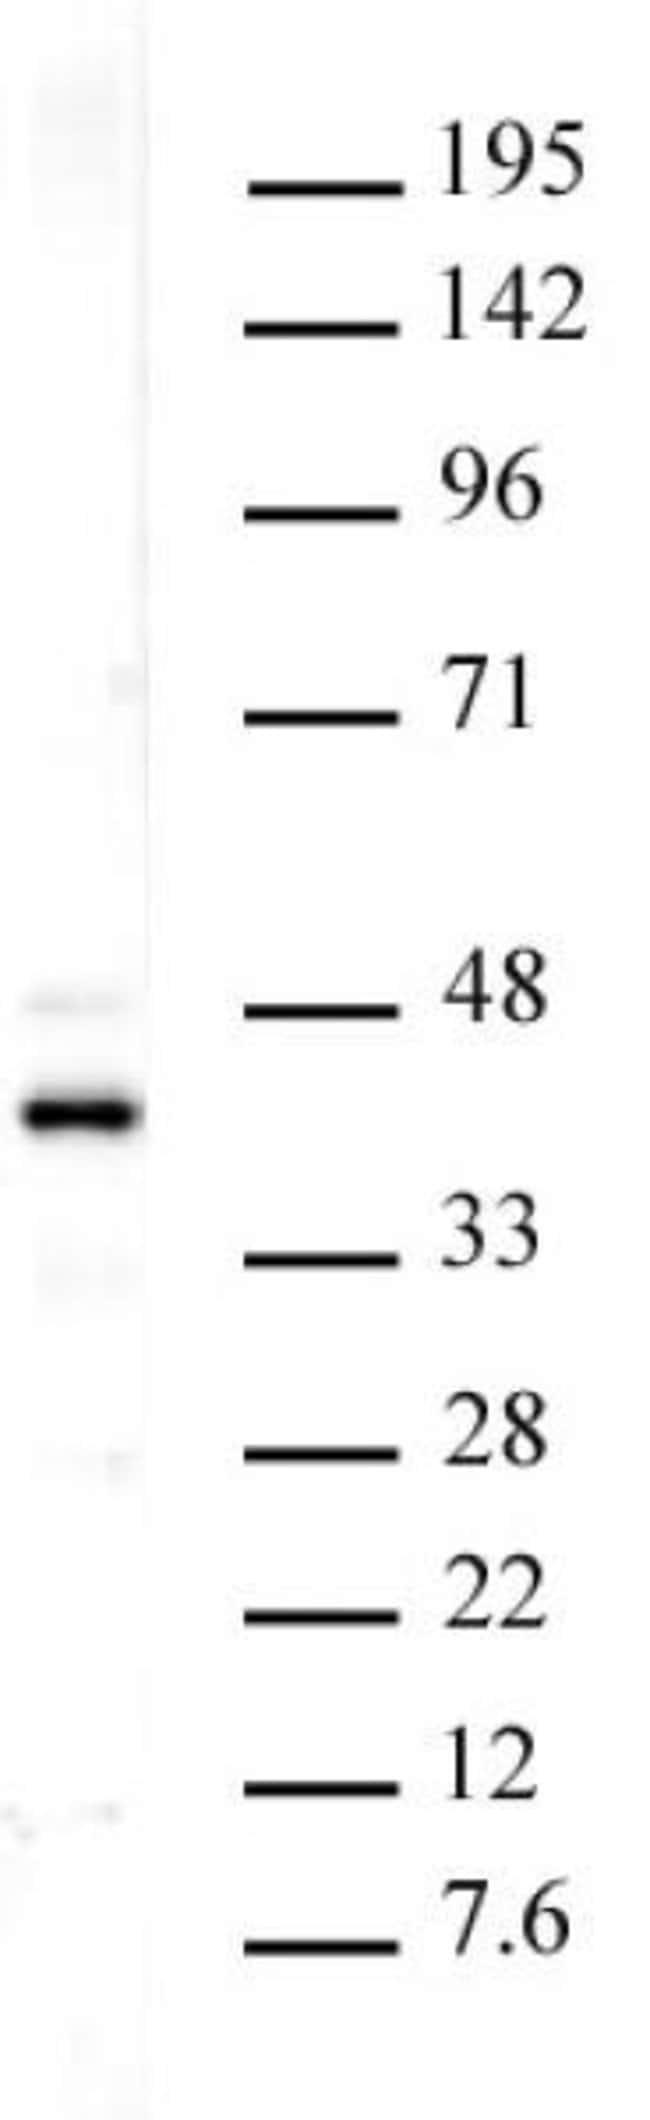 Histone macroH2A1 Rabbit anti-Human, Mouse, Unconjugated, Polyclonal, Active